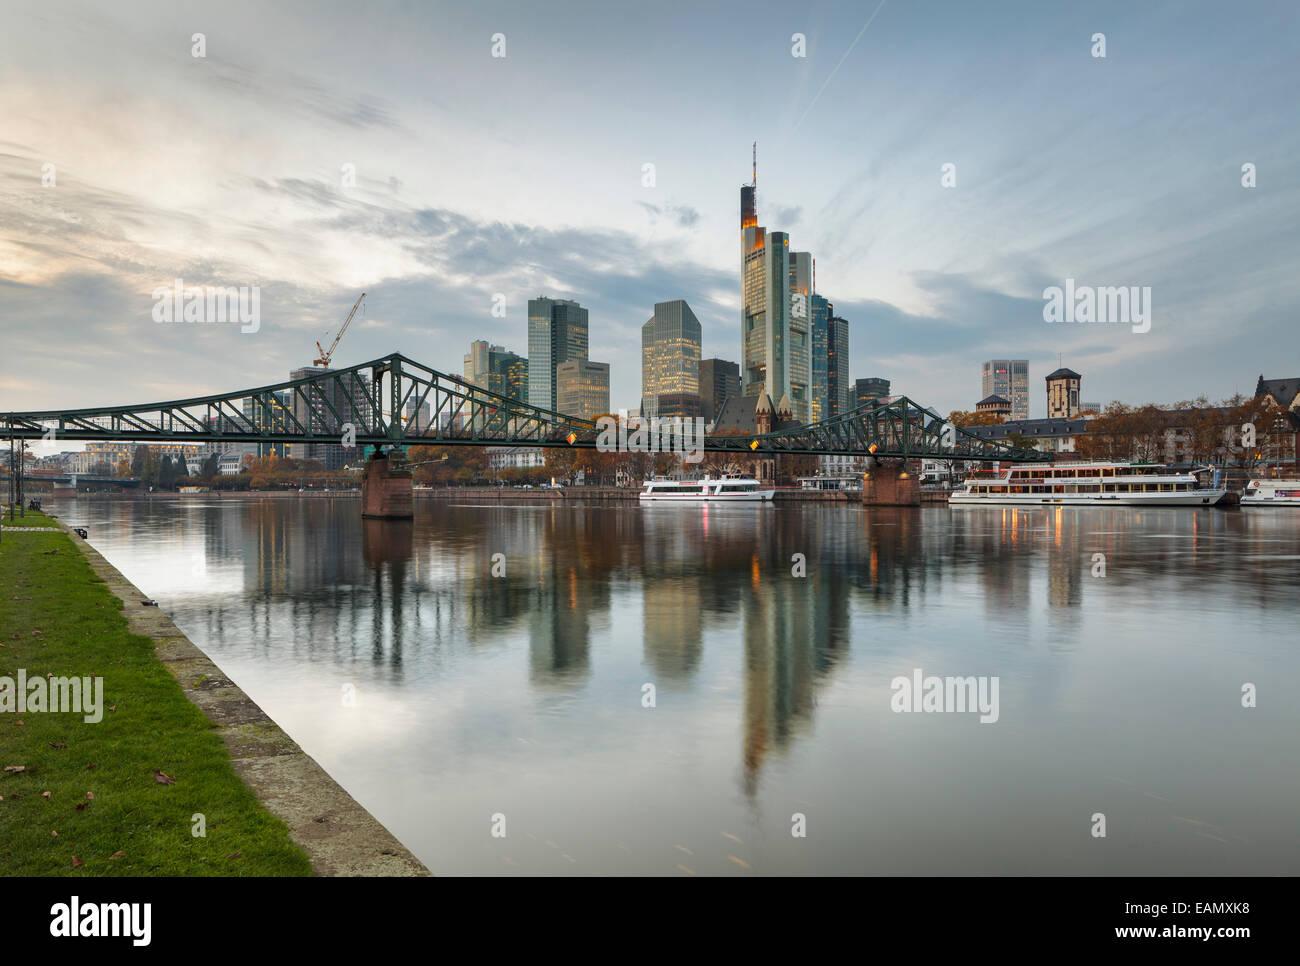 river-main-with-skyline-frankfurt-am-mai